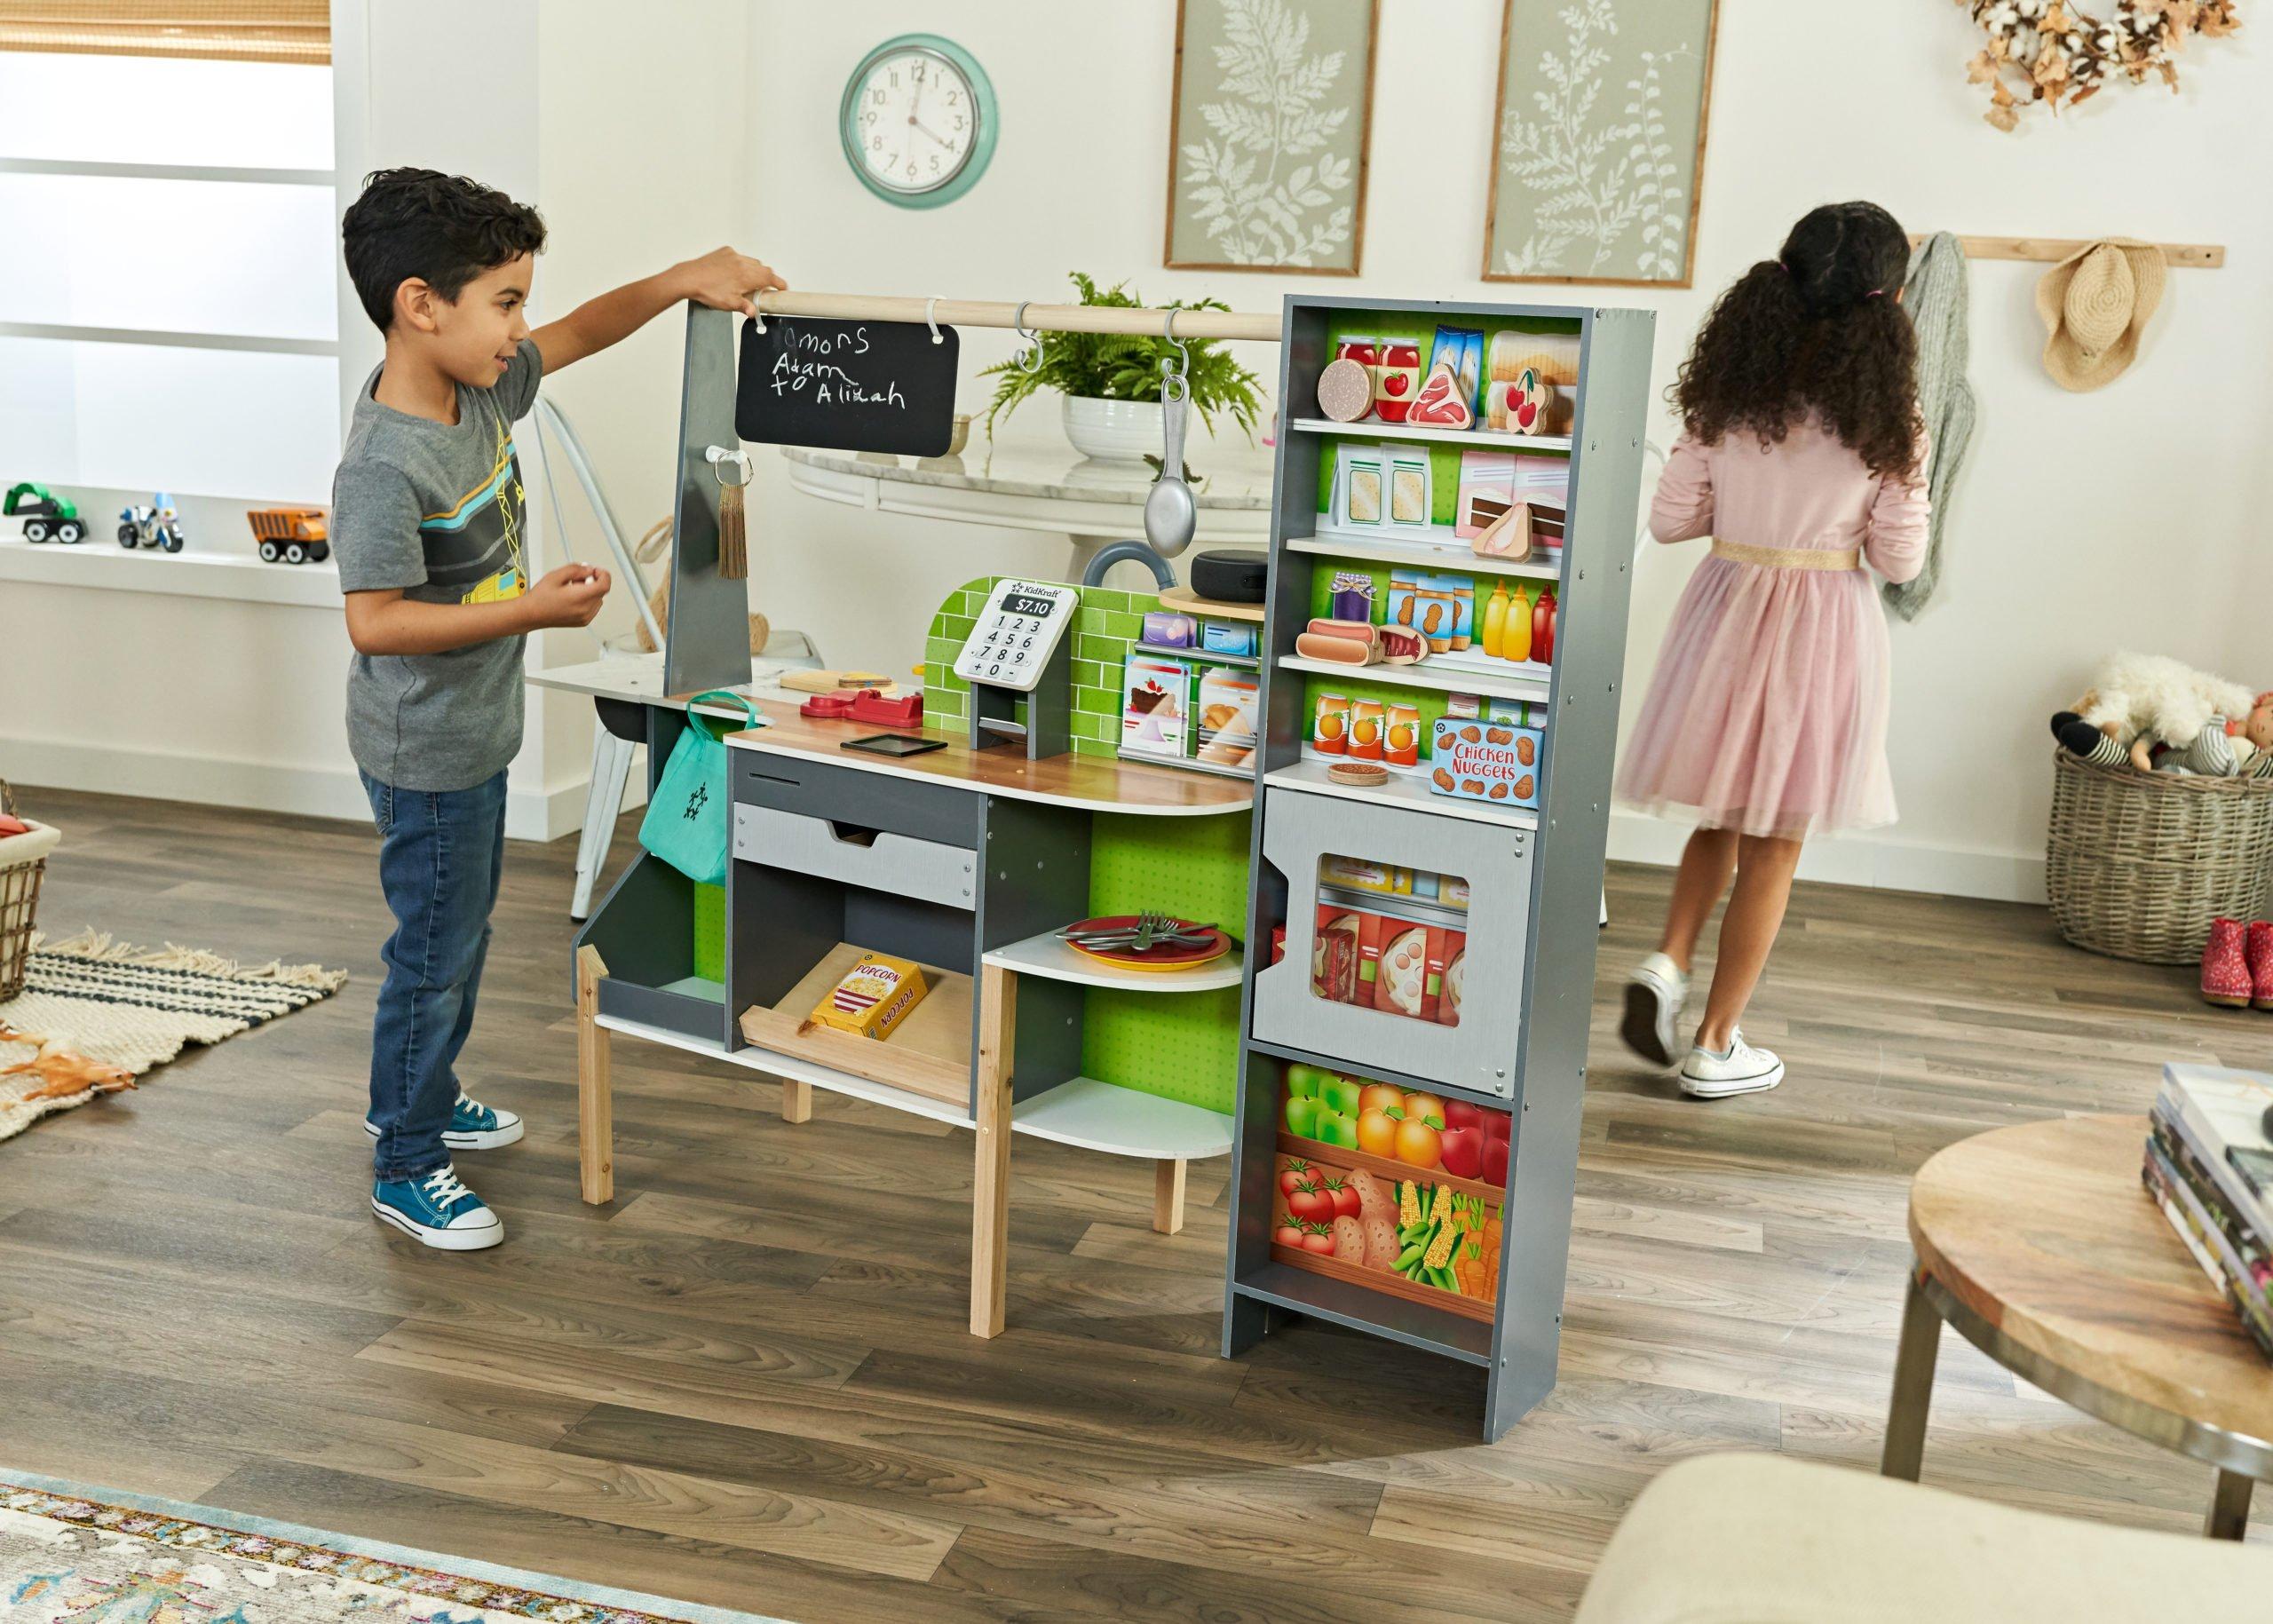 This interactive children's kitchen set comes with Alexa 14